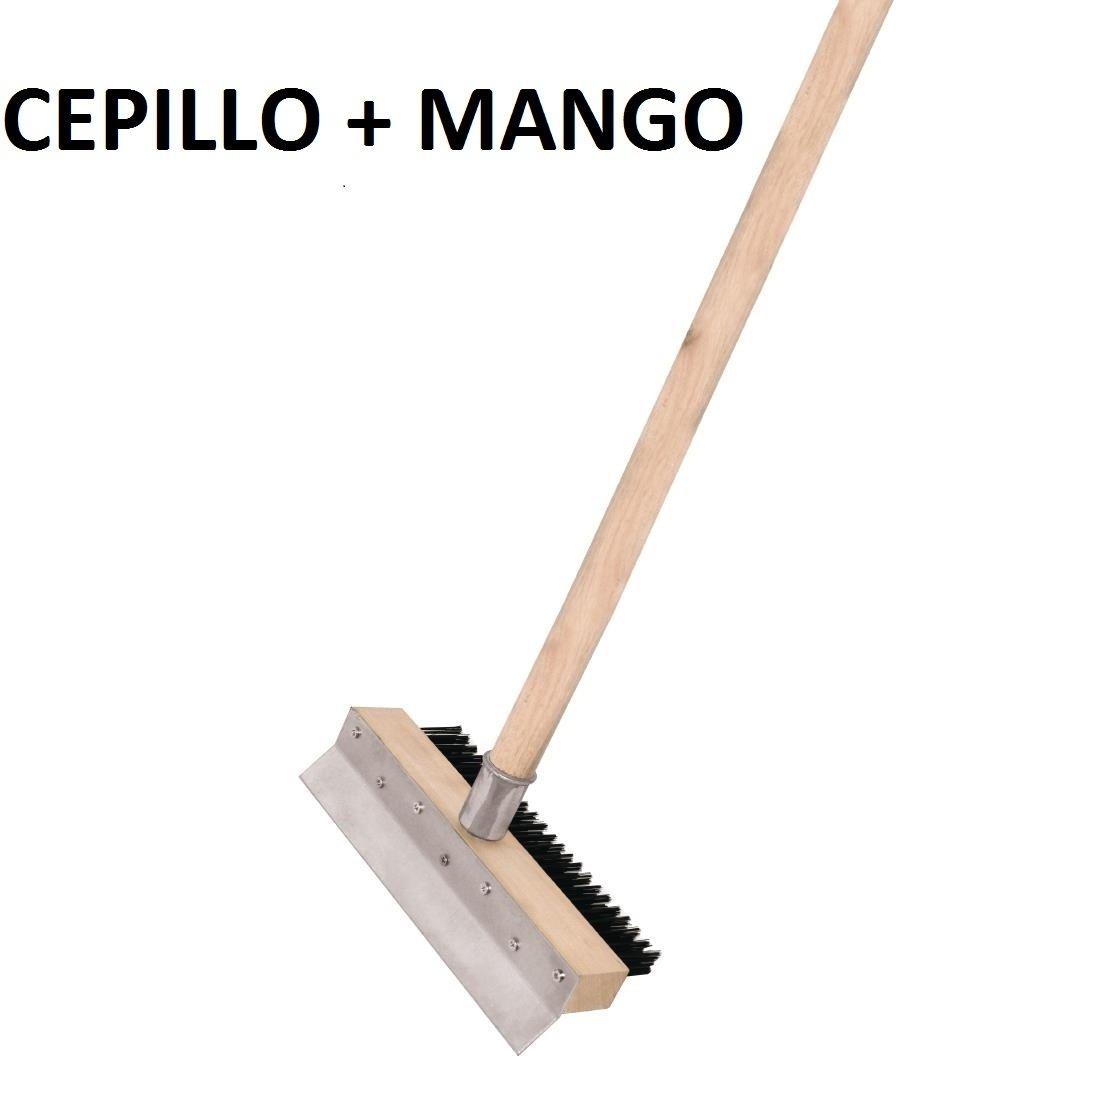 chiner - Cepillo Horno de Pizza y Mango para Cepillo (Cepillo + ...